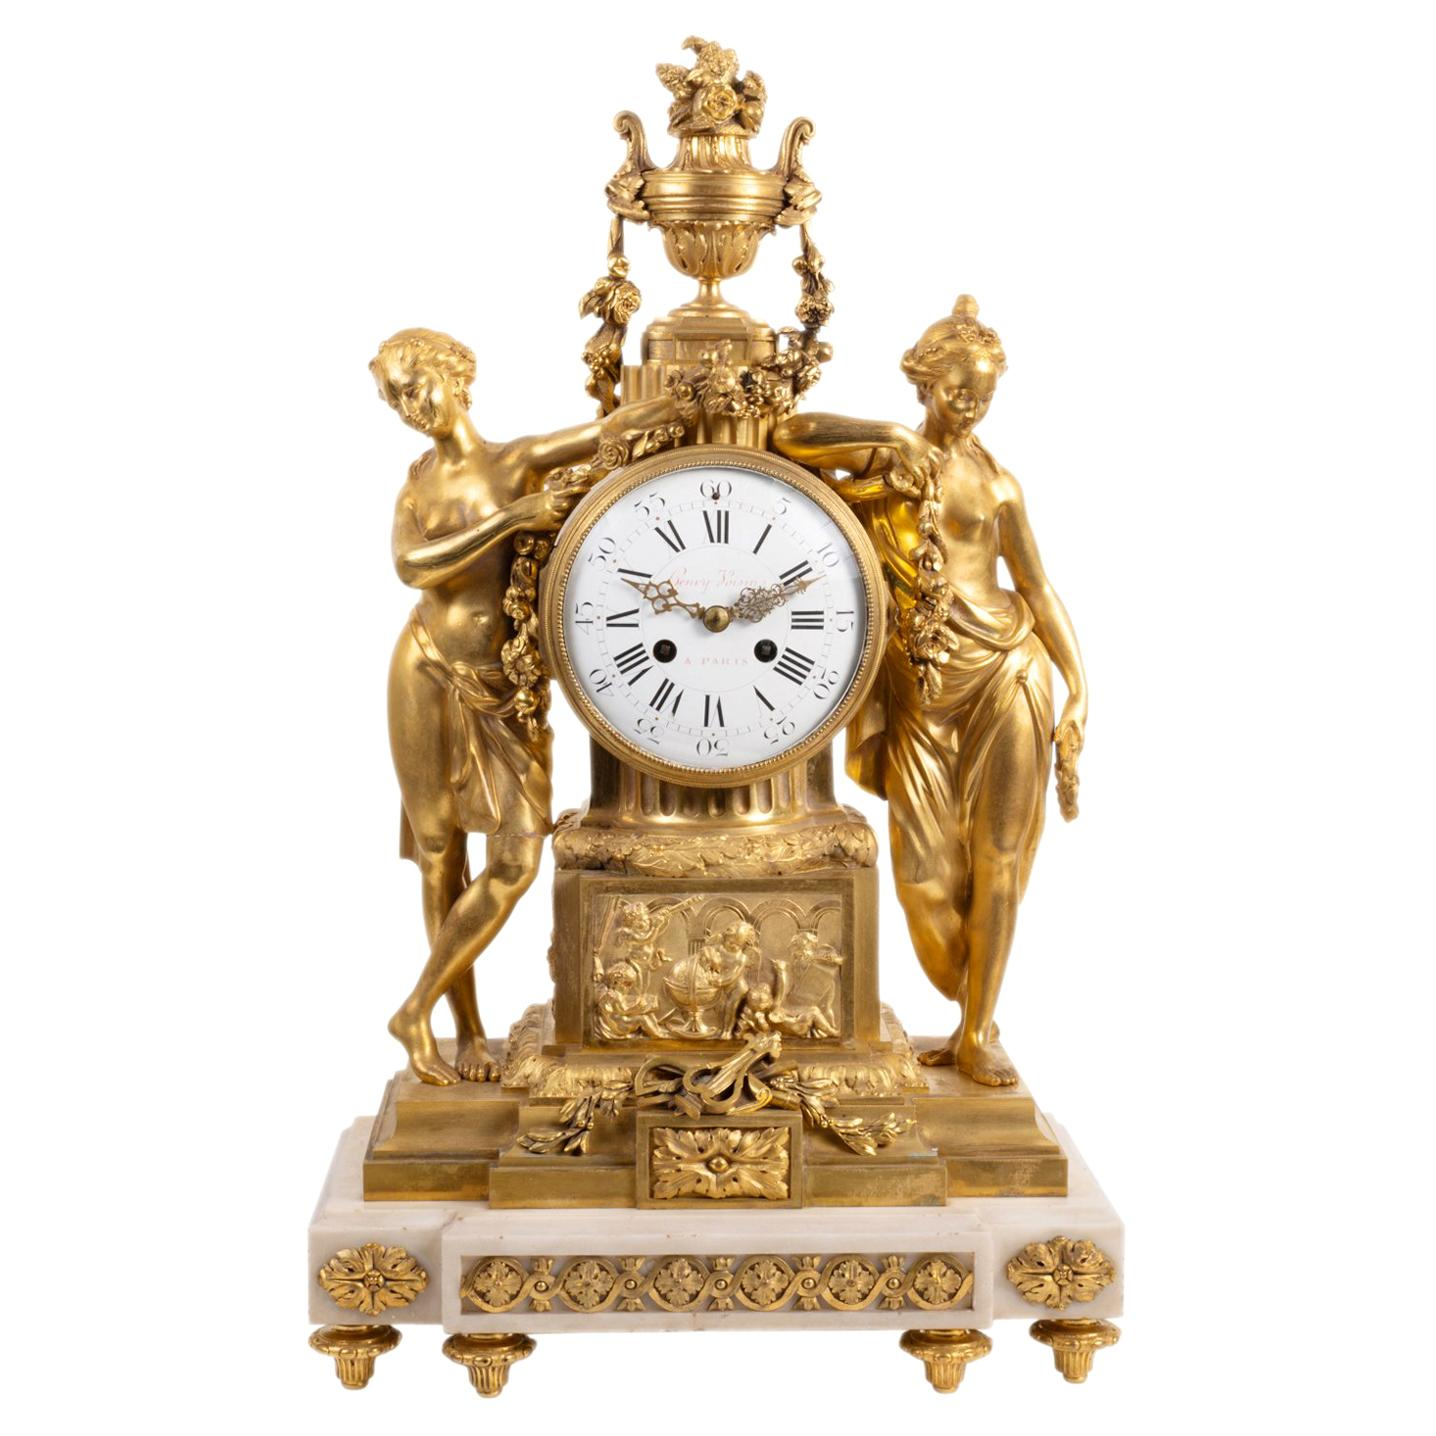 Large Louis XVI Style Ormolu Mantel Clock, 19th Century